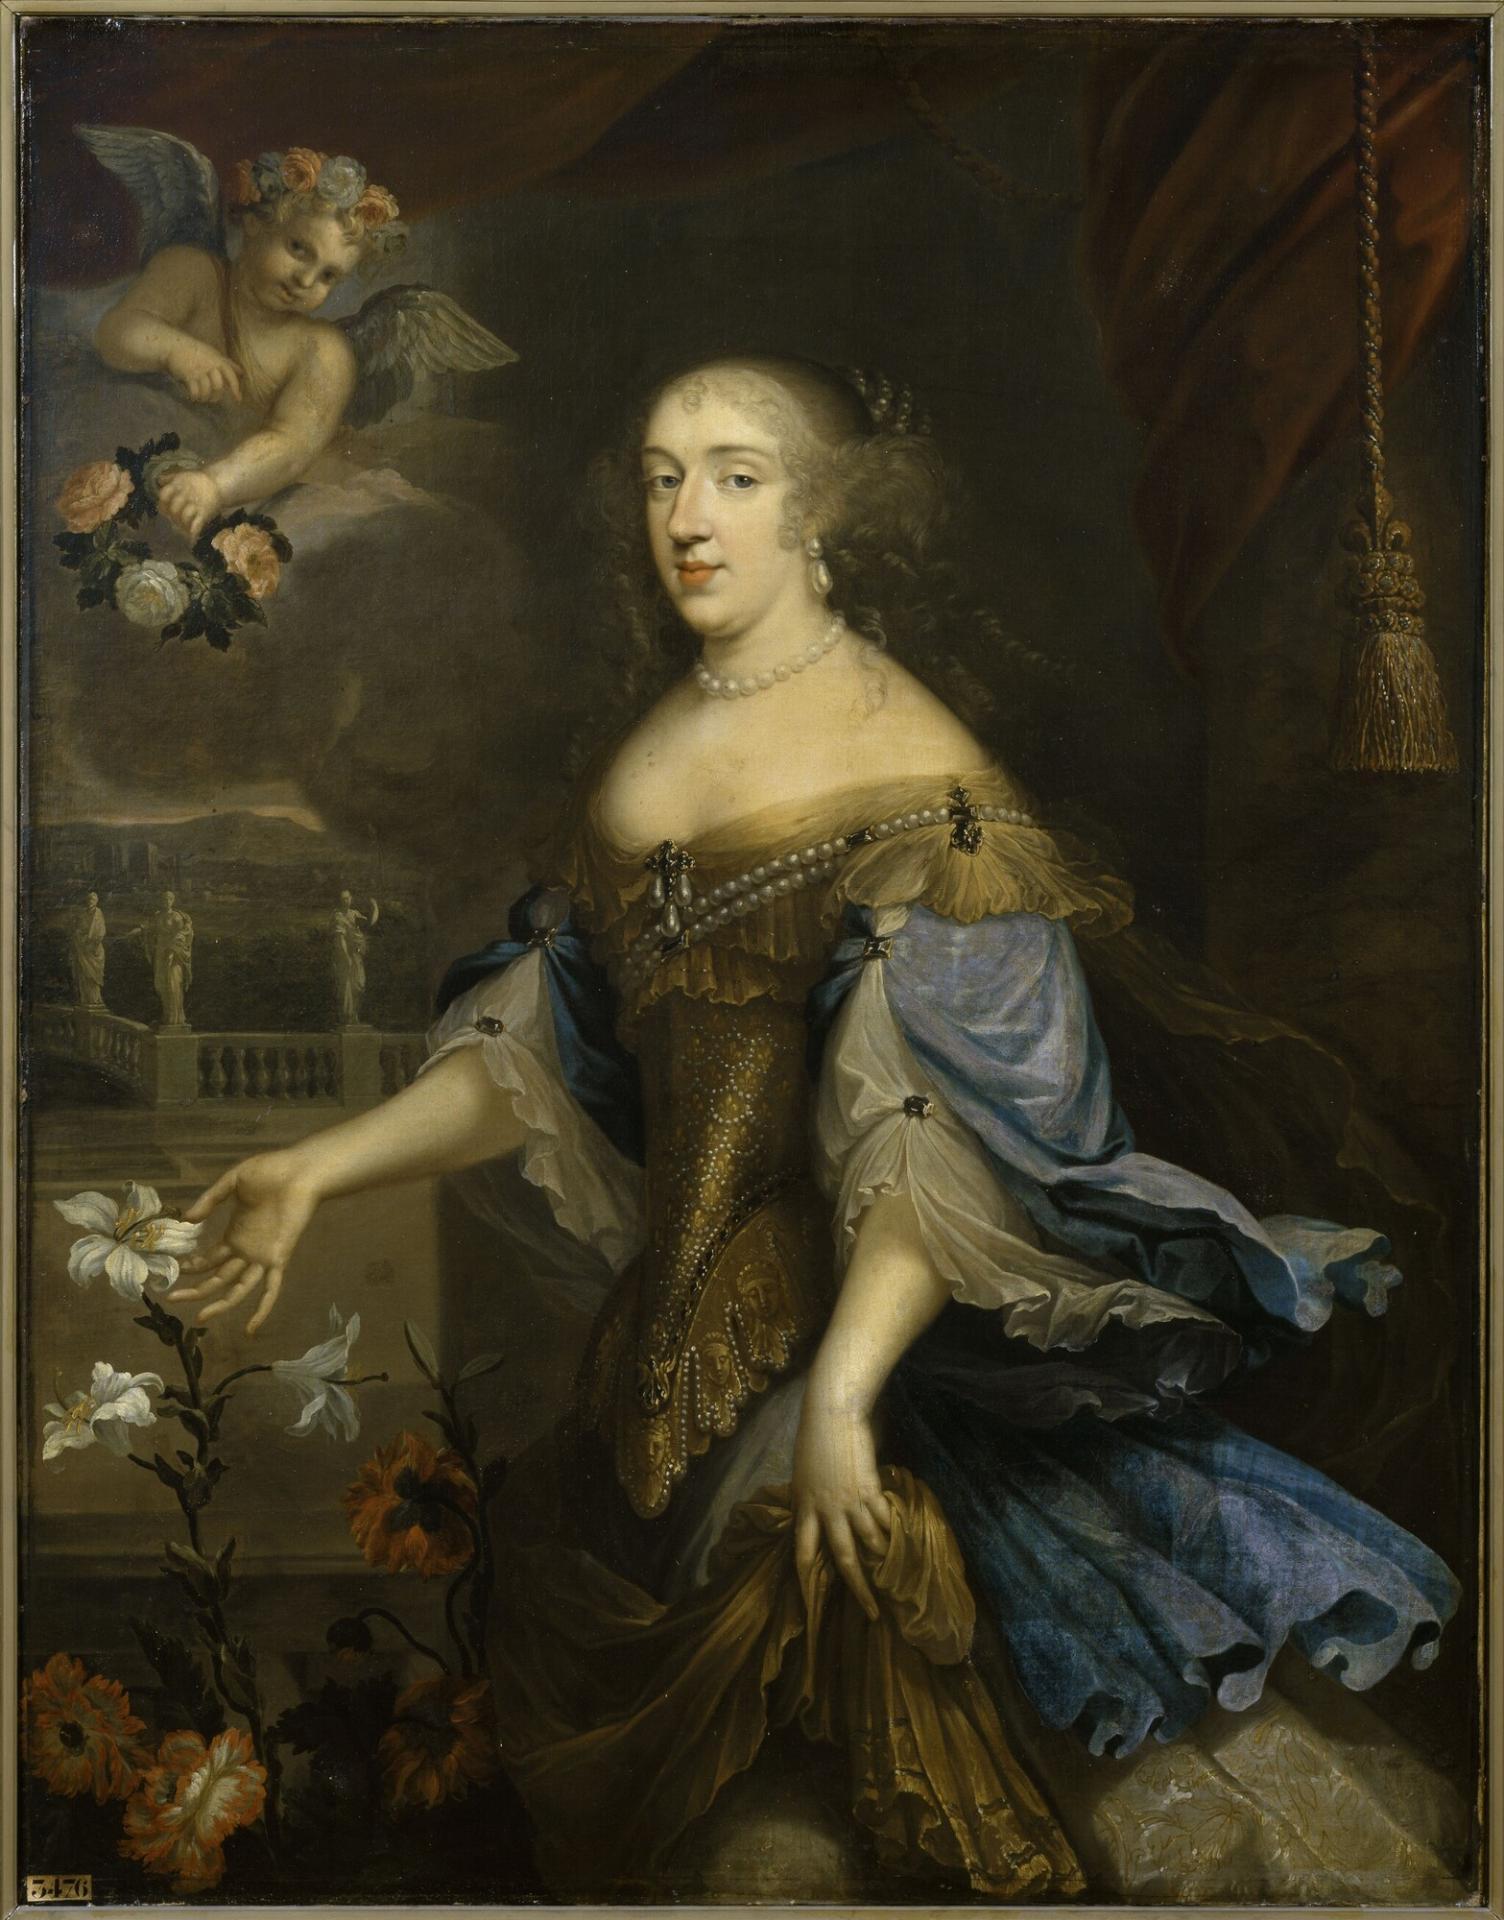 Anne marie louise d orleans duchess of montpensier la grande mademoiselle versailles mv 3476